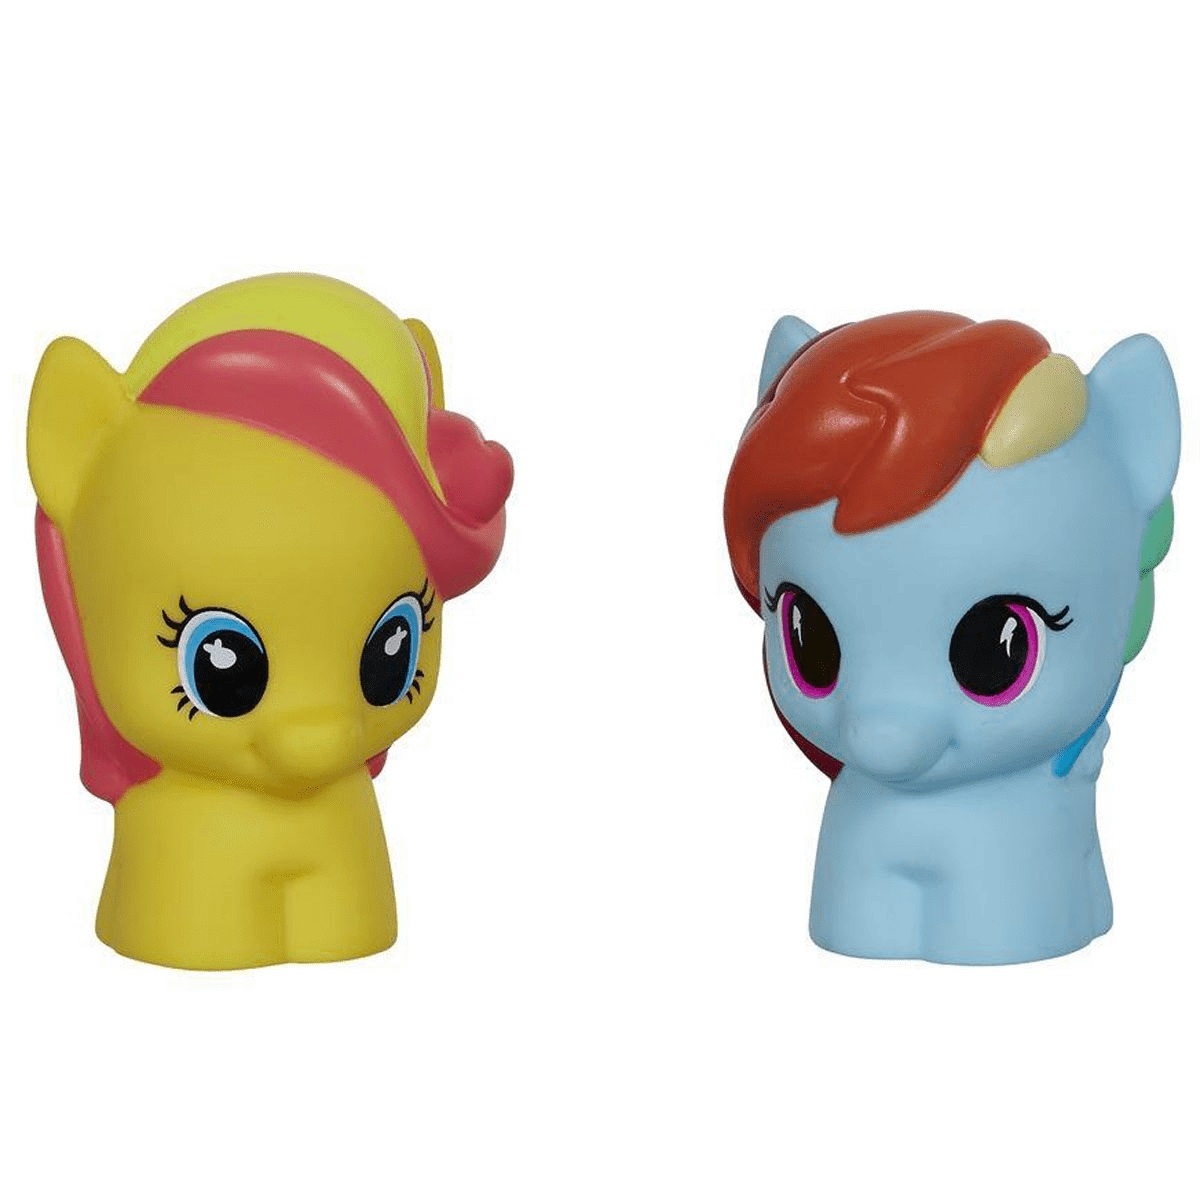 Пони-малышки Мун Рэинбоу Дэш и Бамблсвит My Little Pony по цене 306